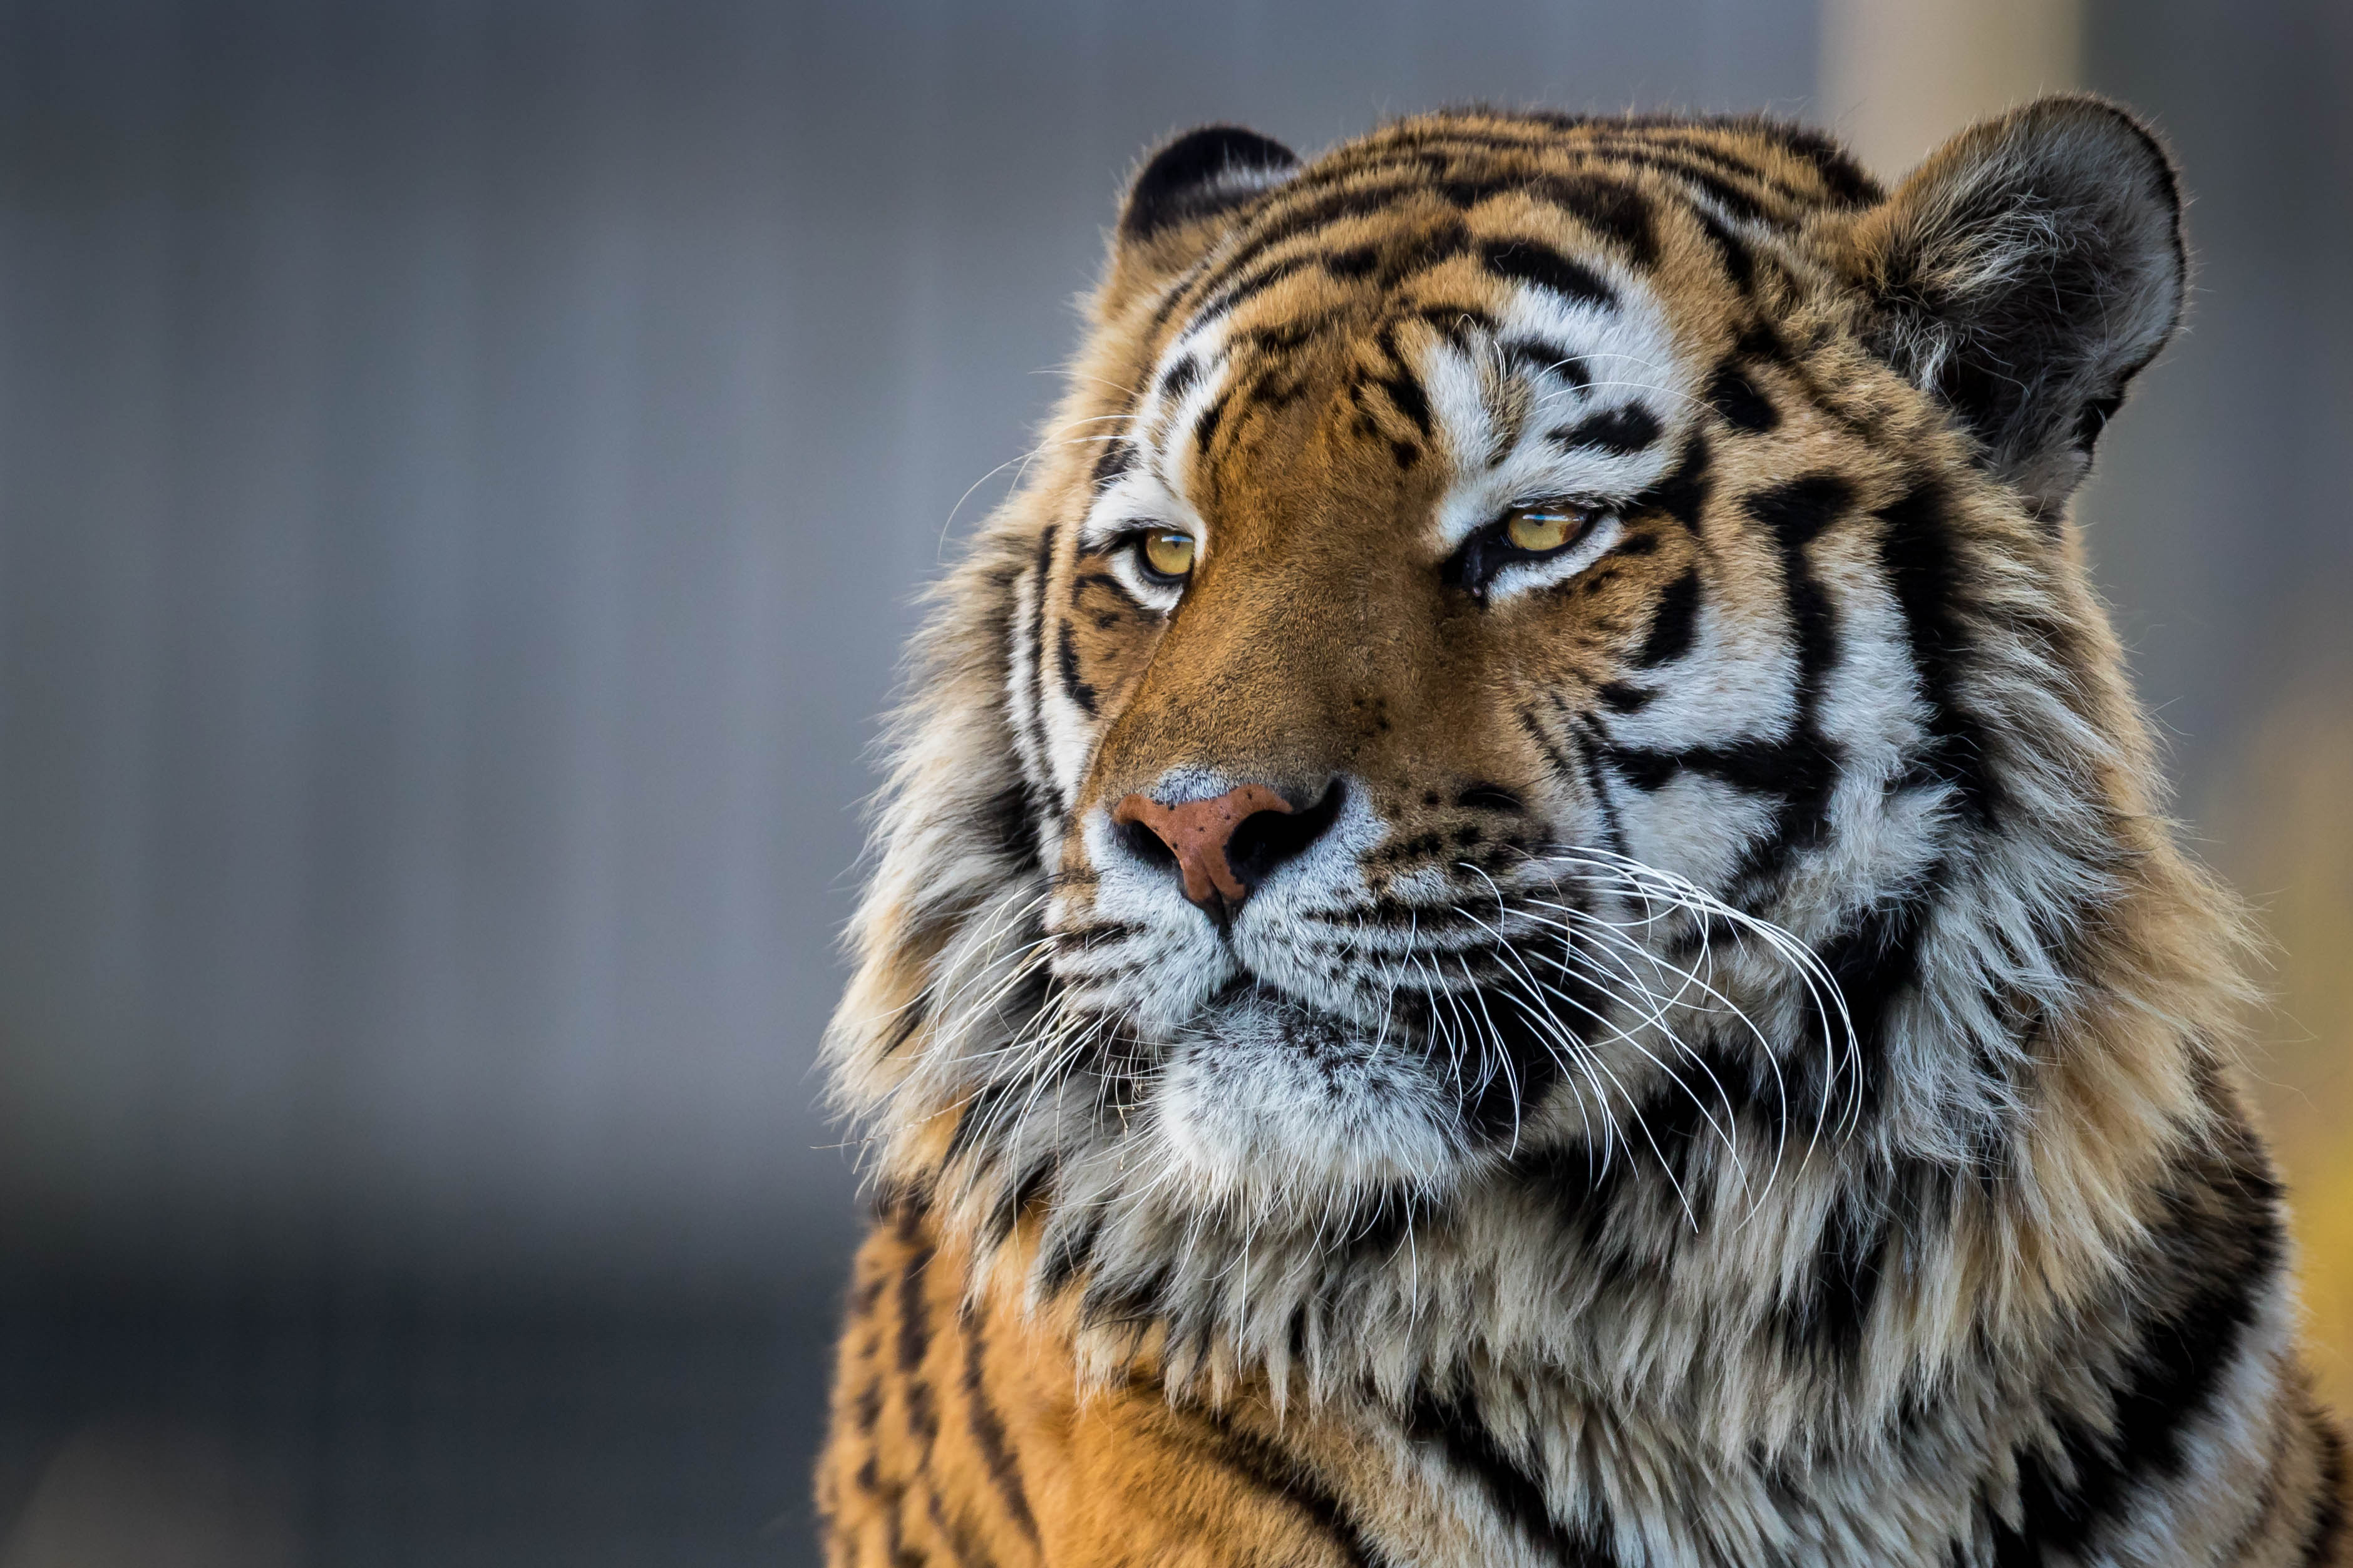 Tiger Closeup 4k, HD Animals, 4k Wallpapers, Images ...